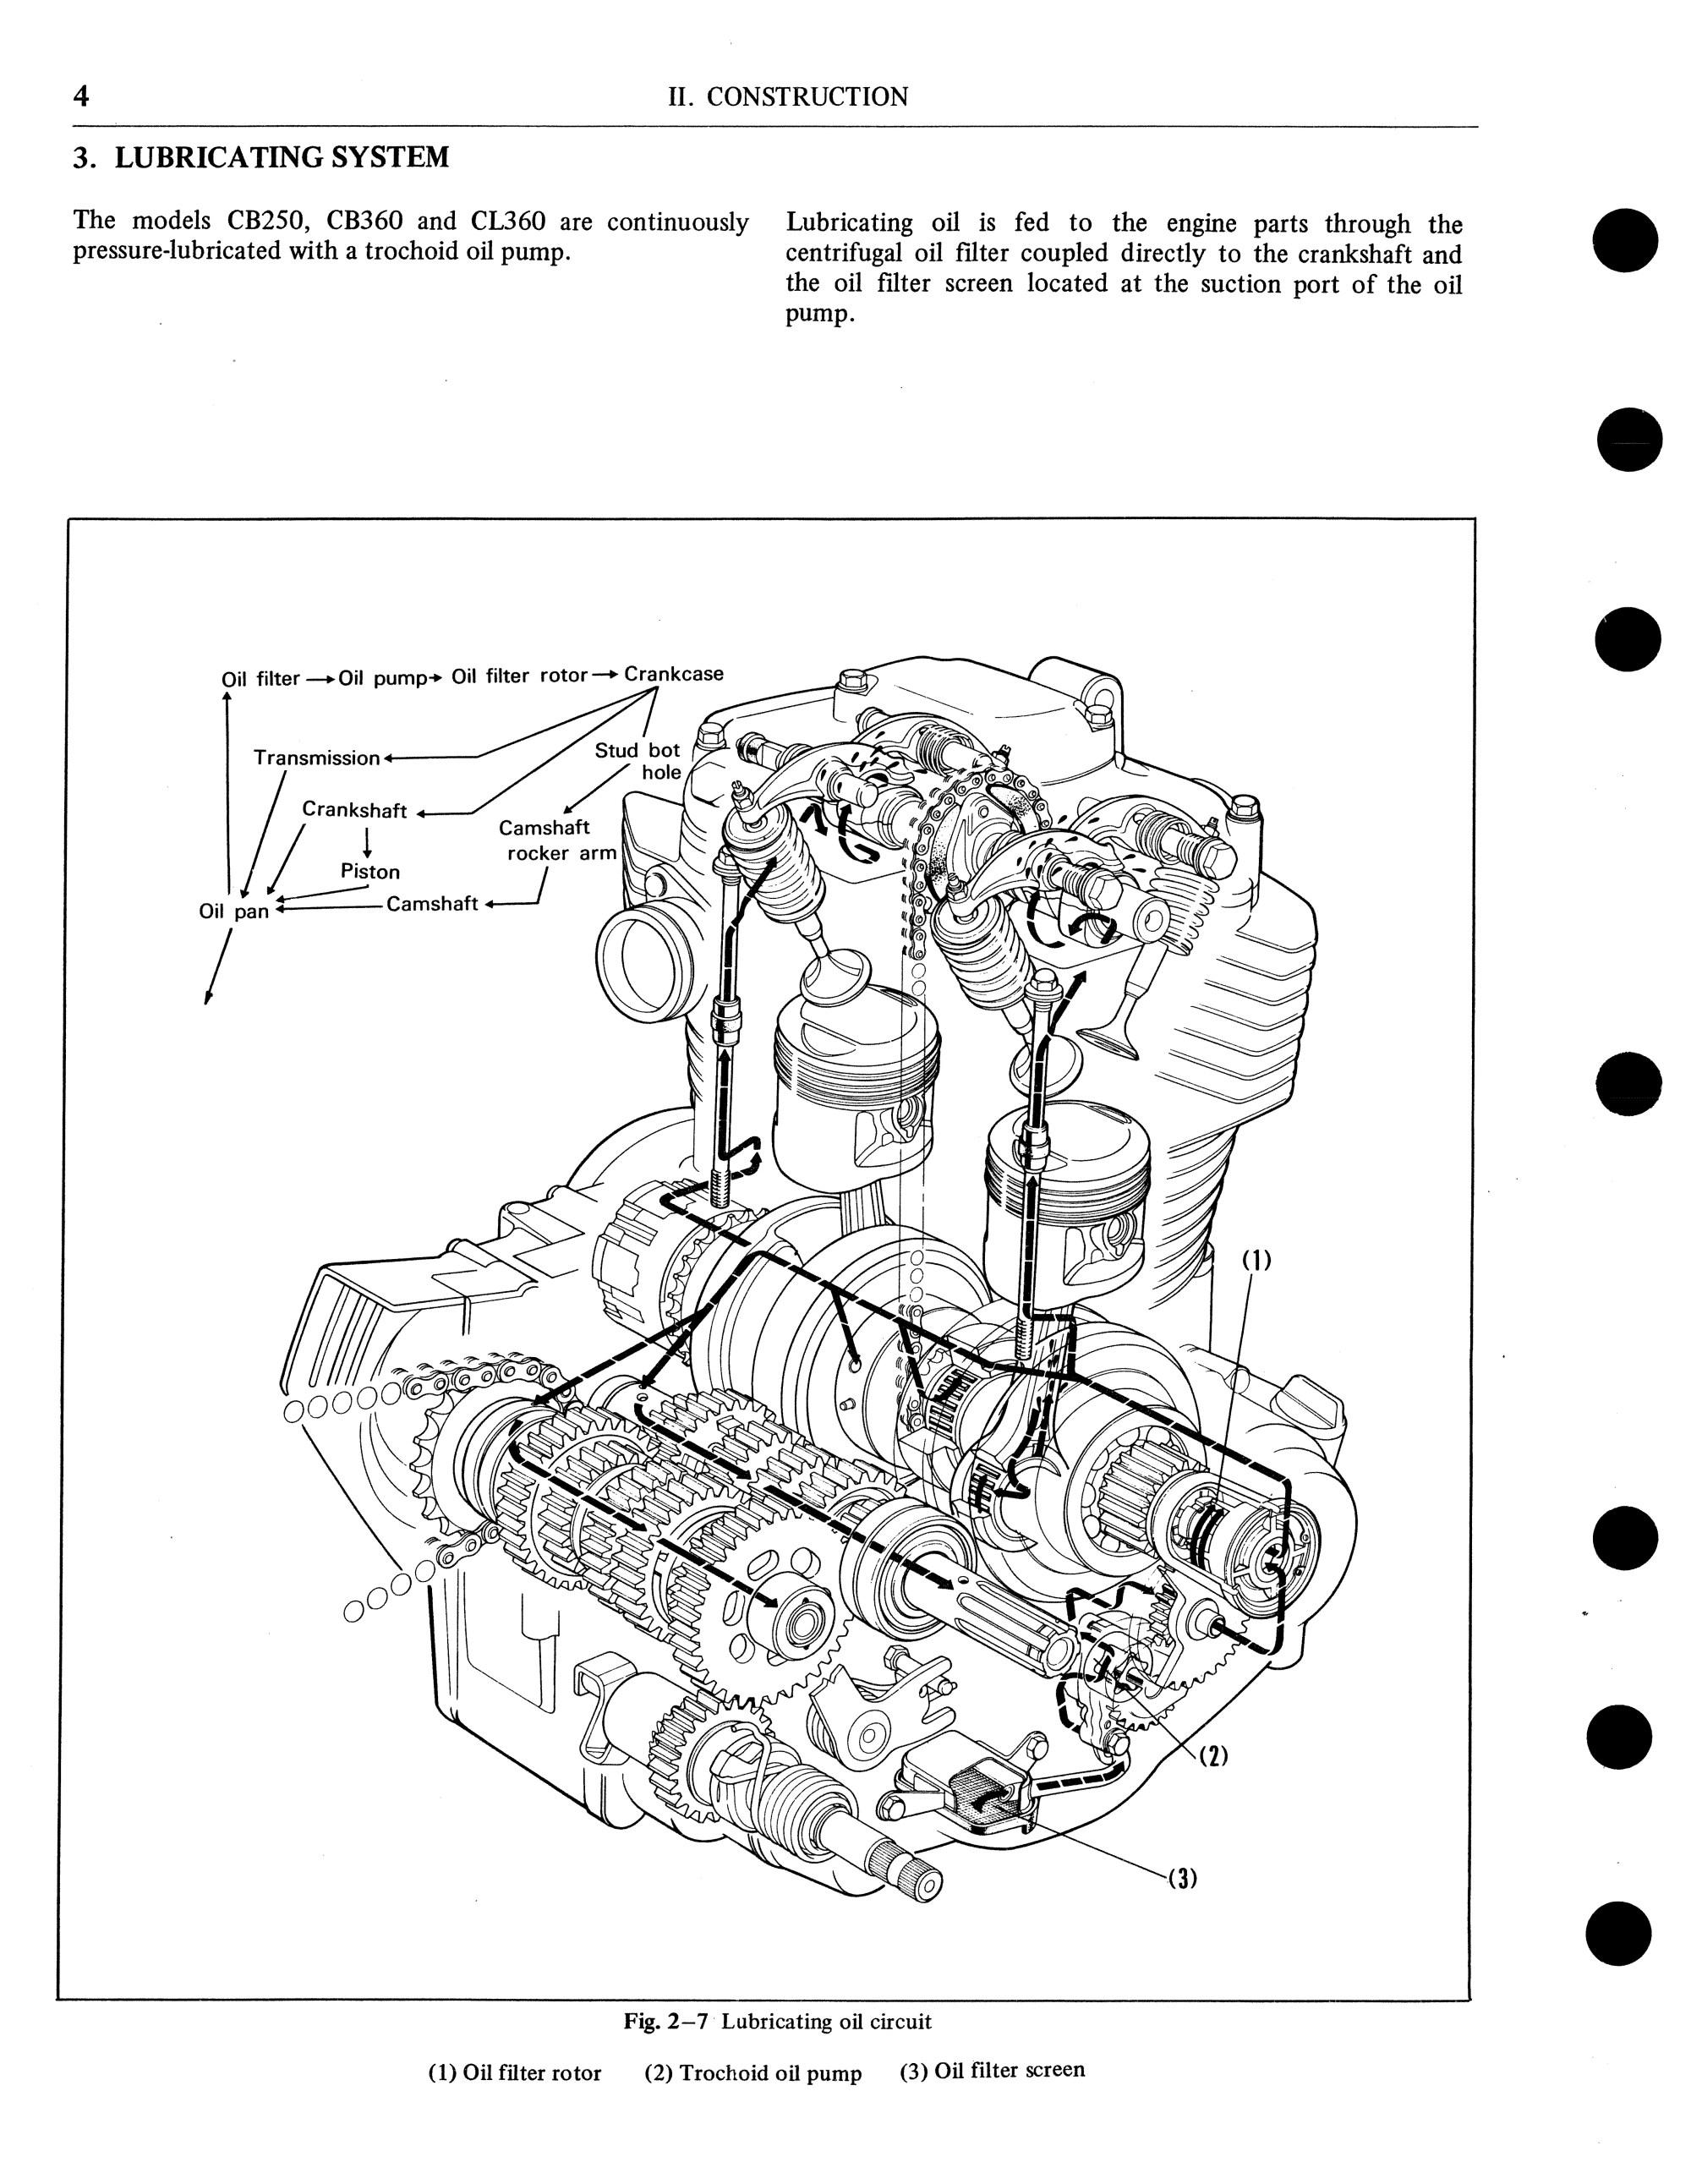 hight resolution of cb360 engine diagram wiring diagram expertswrg 1056 cb360 engine diagram cb360 engine diagram